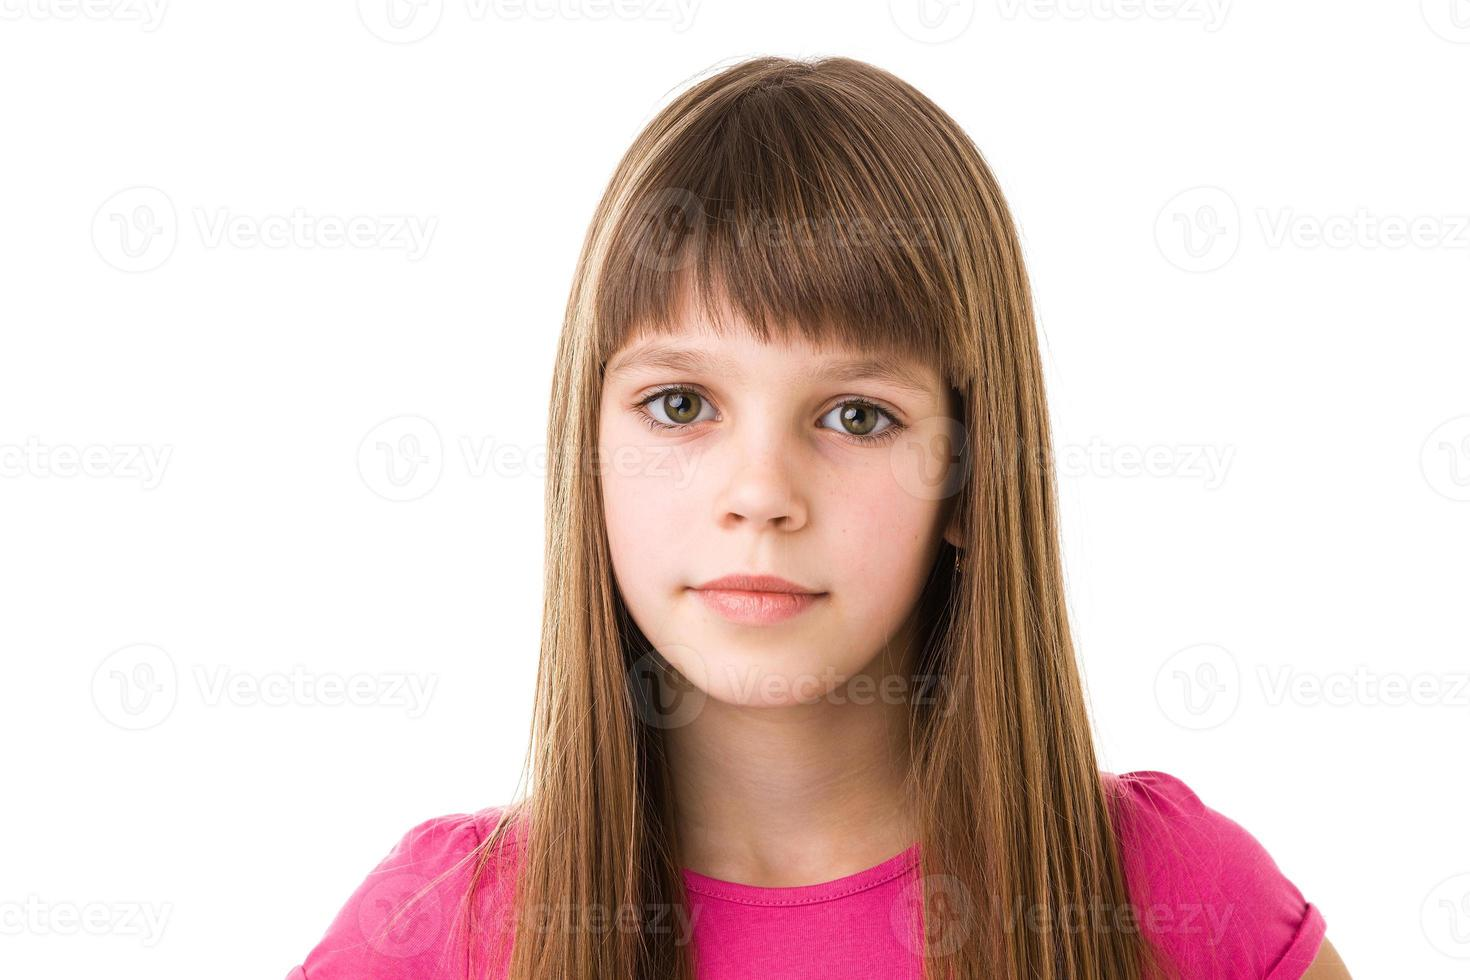 jovem adolescente foto